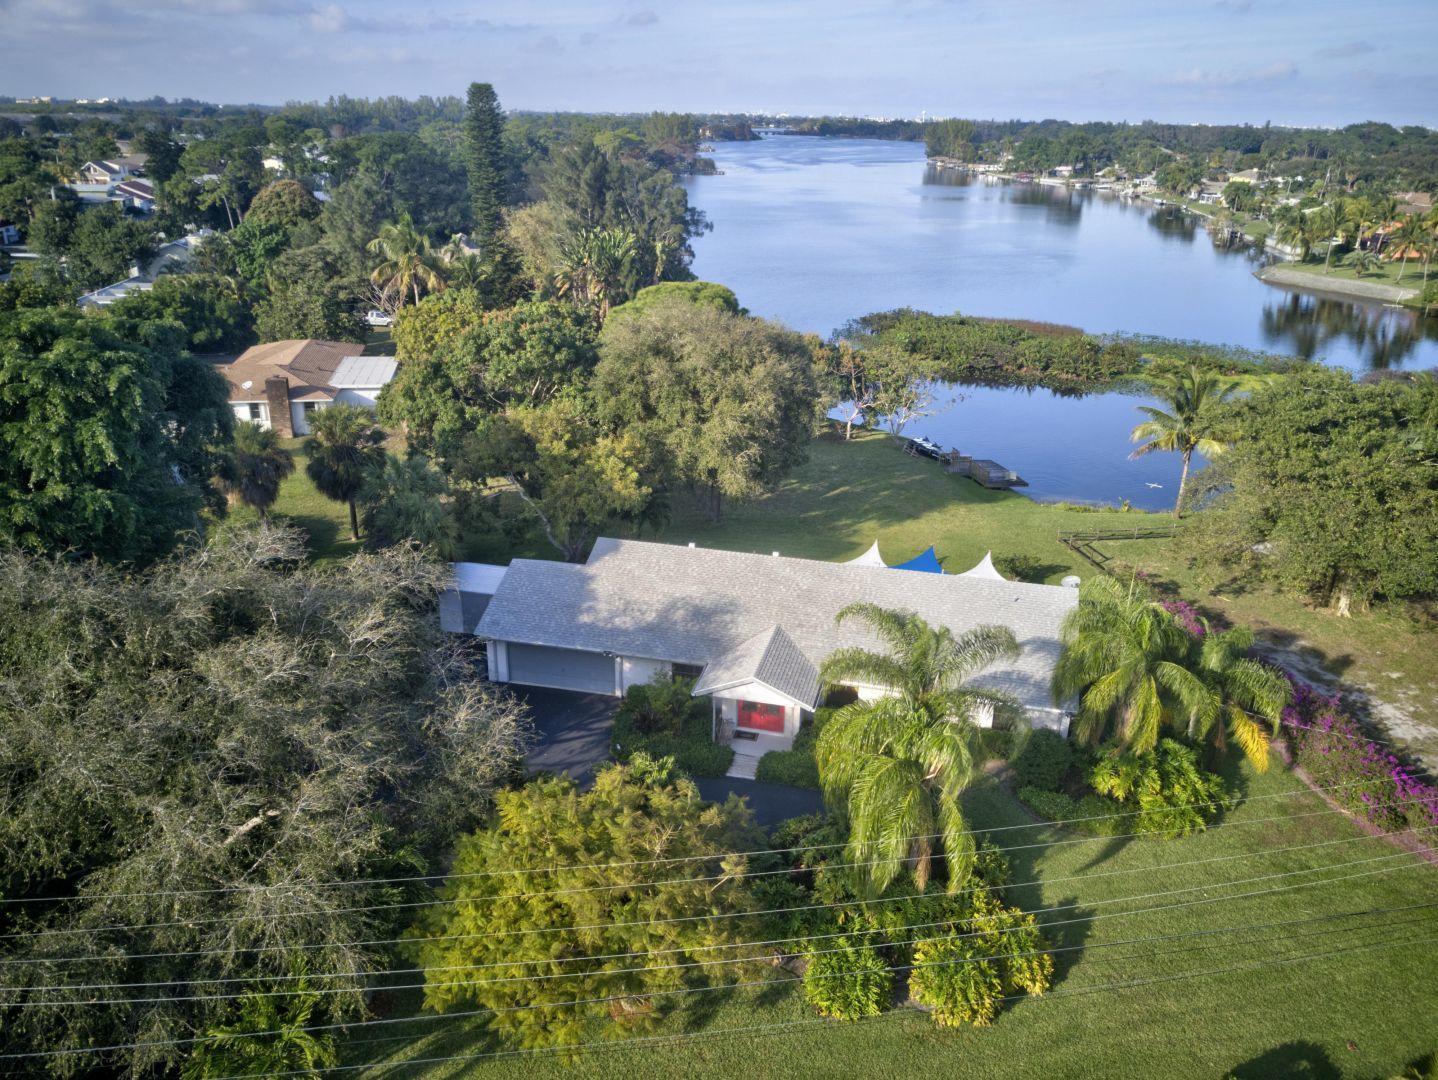 2501 Floral Road, Lake Worth, Florida 33462, 3 Bedrooms Bedrooms, ,2 BathroomsBathrooms,A,Single family,Floral,RX-10504879